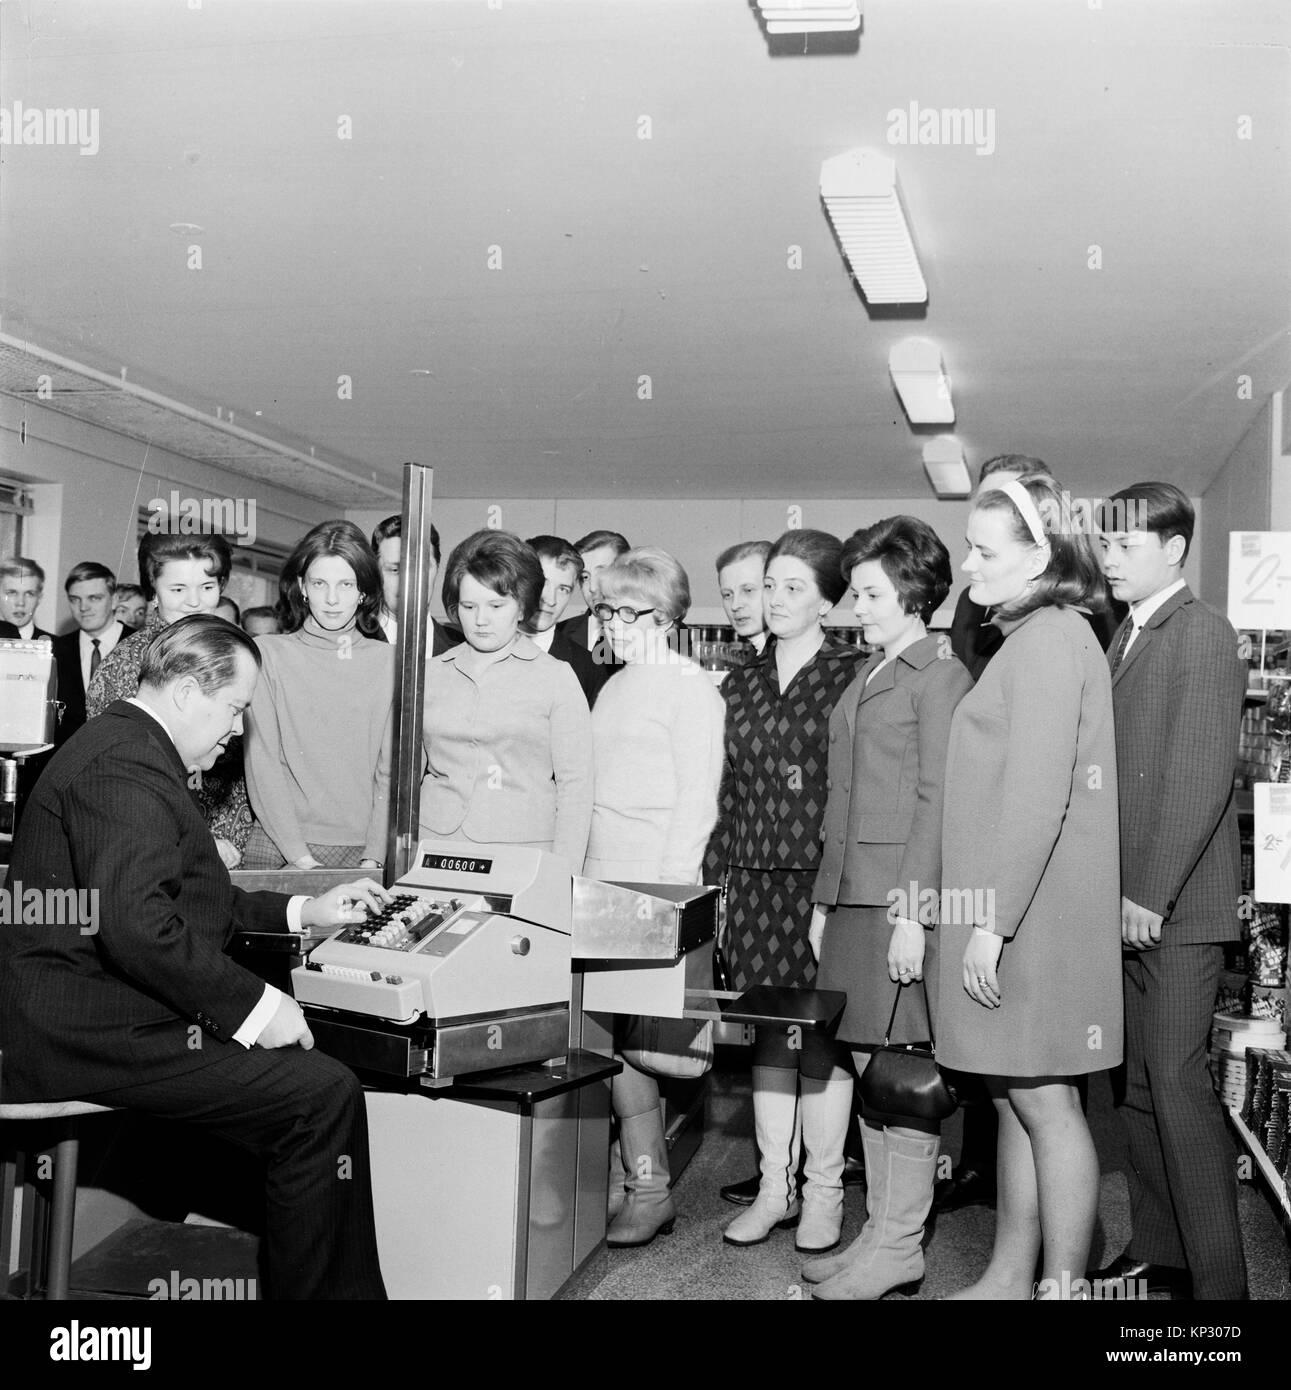 Man demonstrating use of modern cash register till watched by shop staff, Helsinki, Finland, 1960s - Stock Image